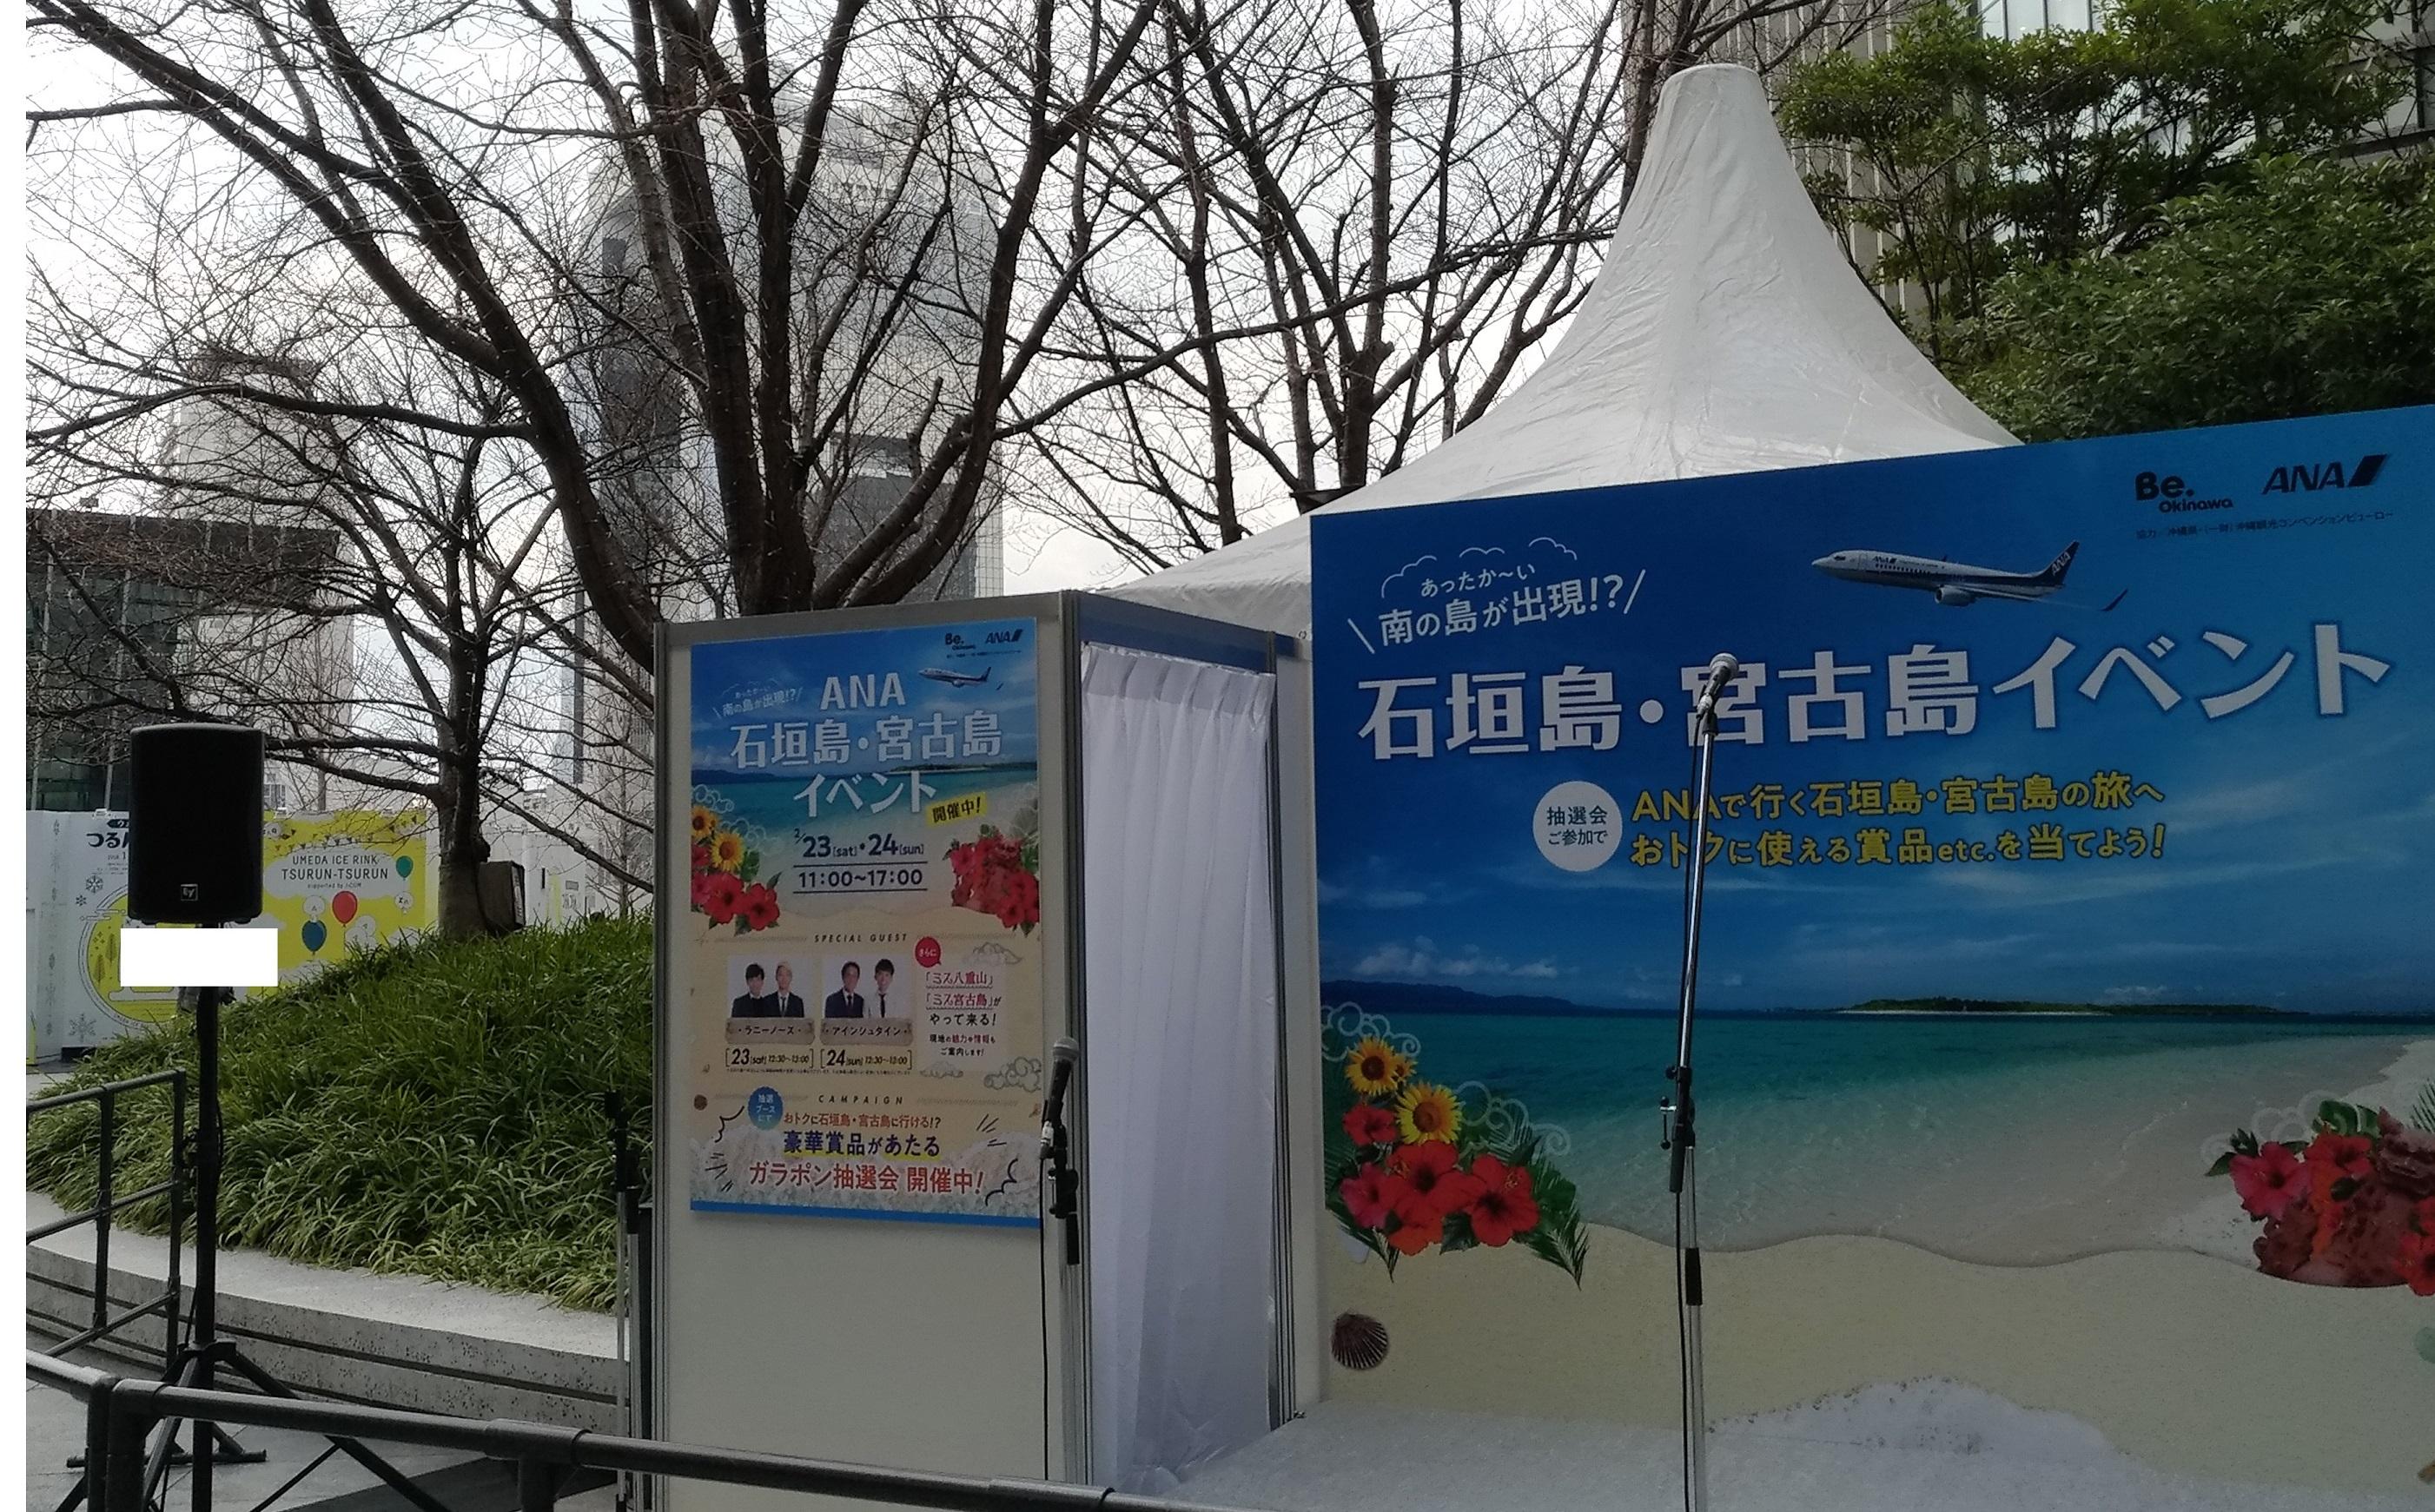 osaka_umeda_ana_events_1.jpg